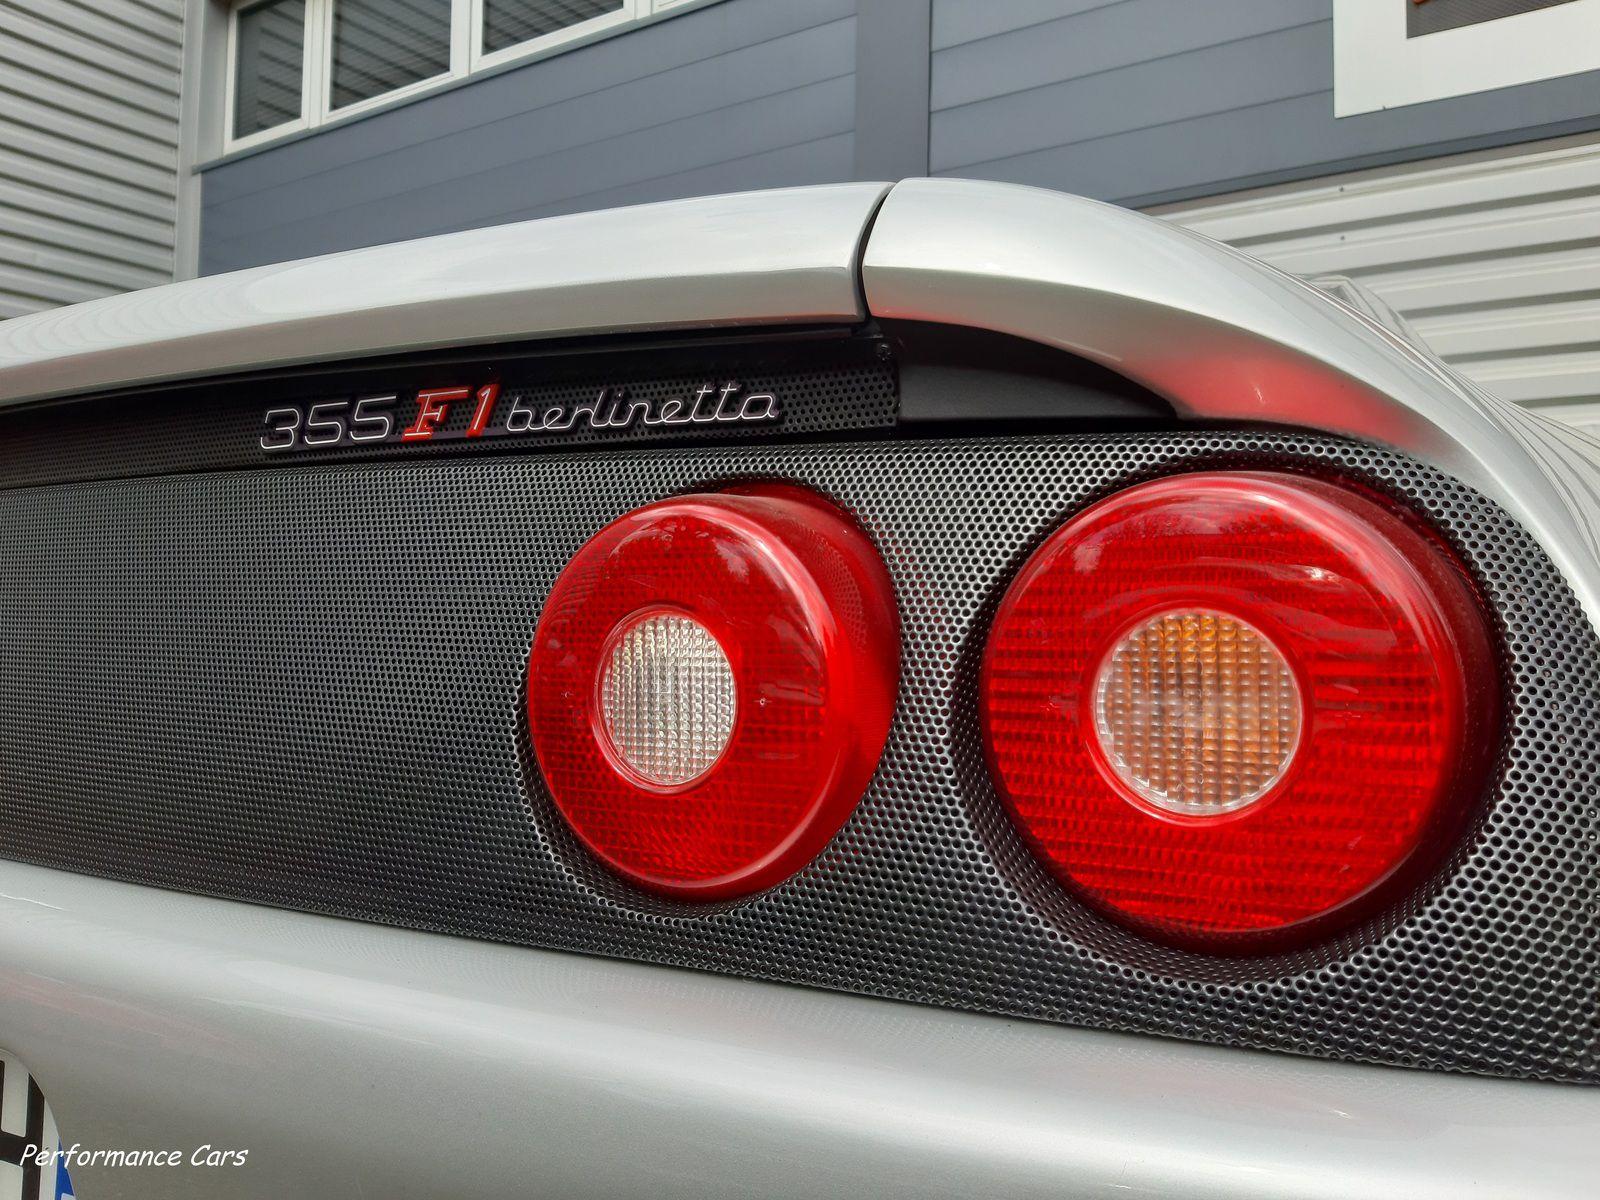 Une F1 berlinetta